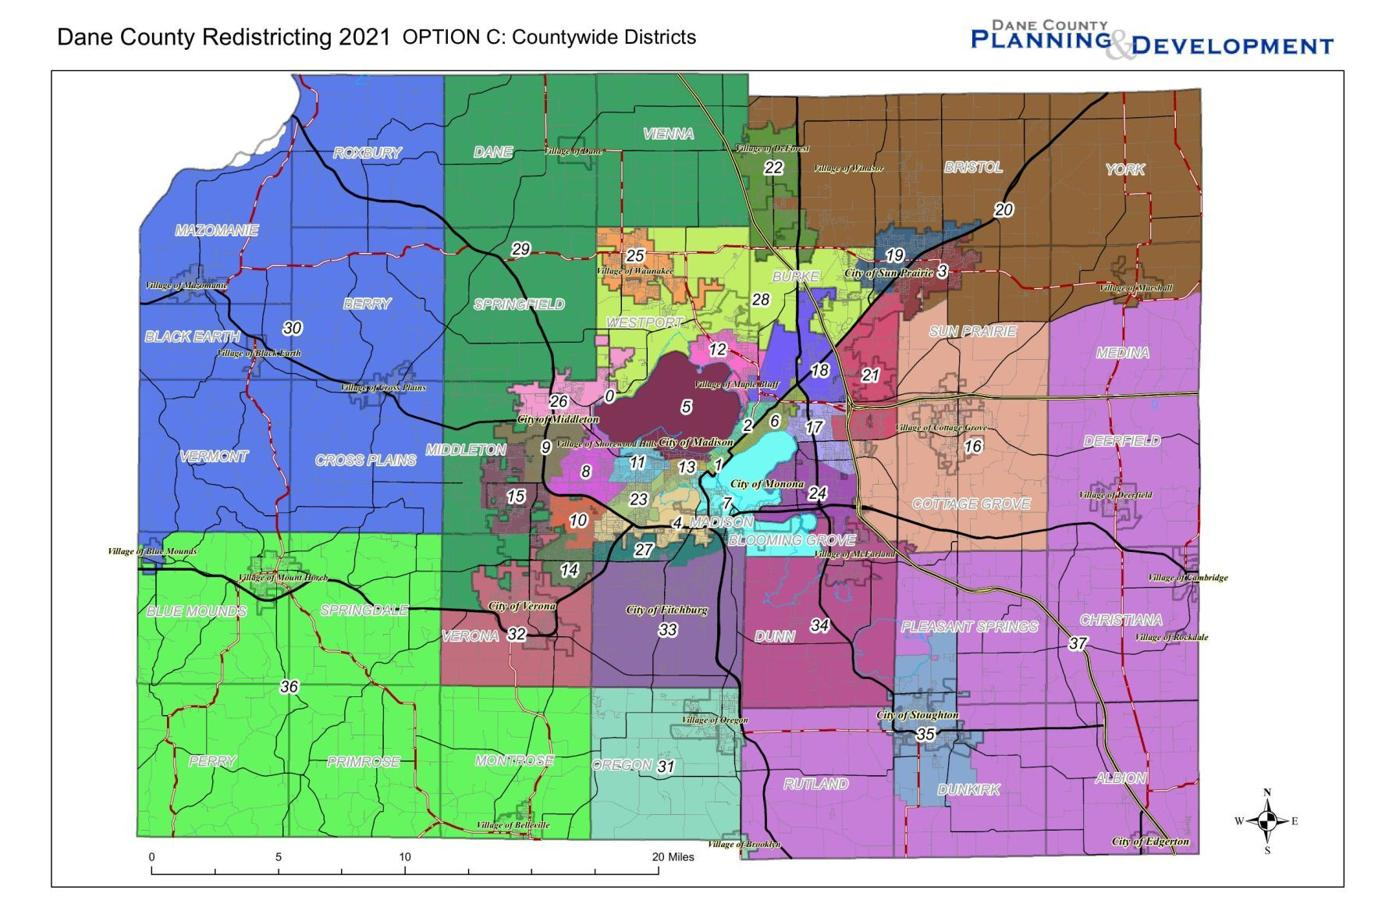 Dane County Redistricting Map Option C.pdf